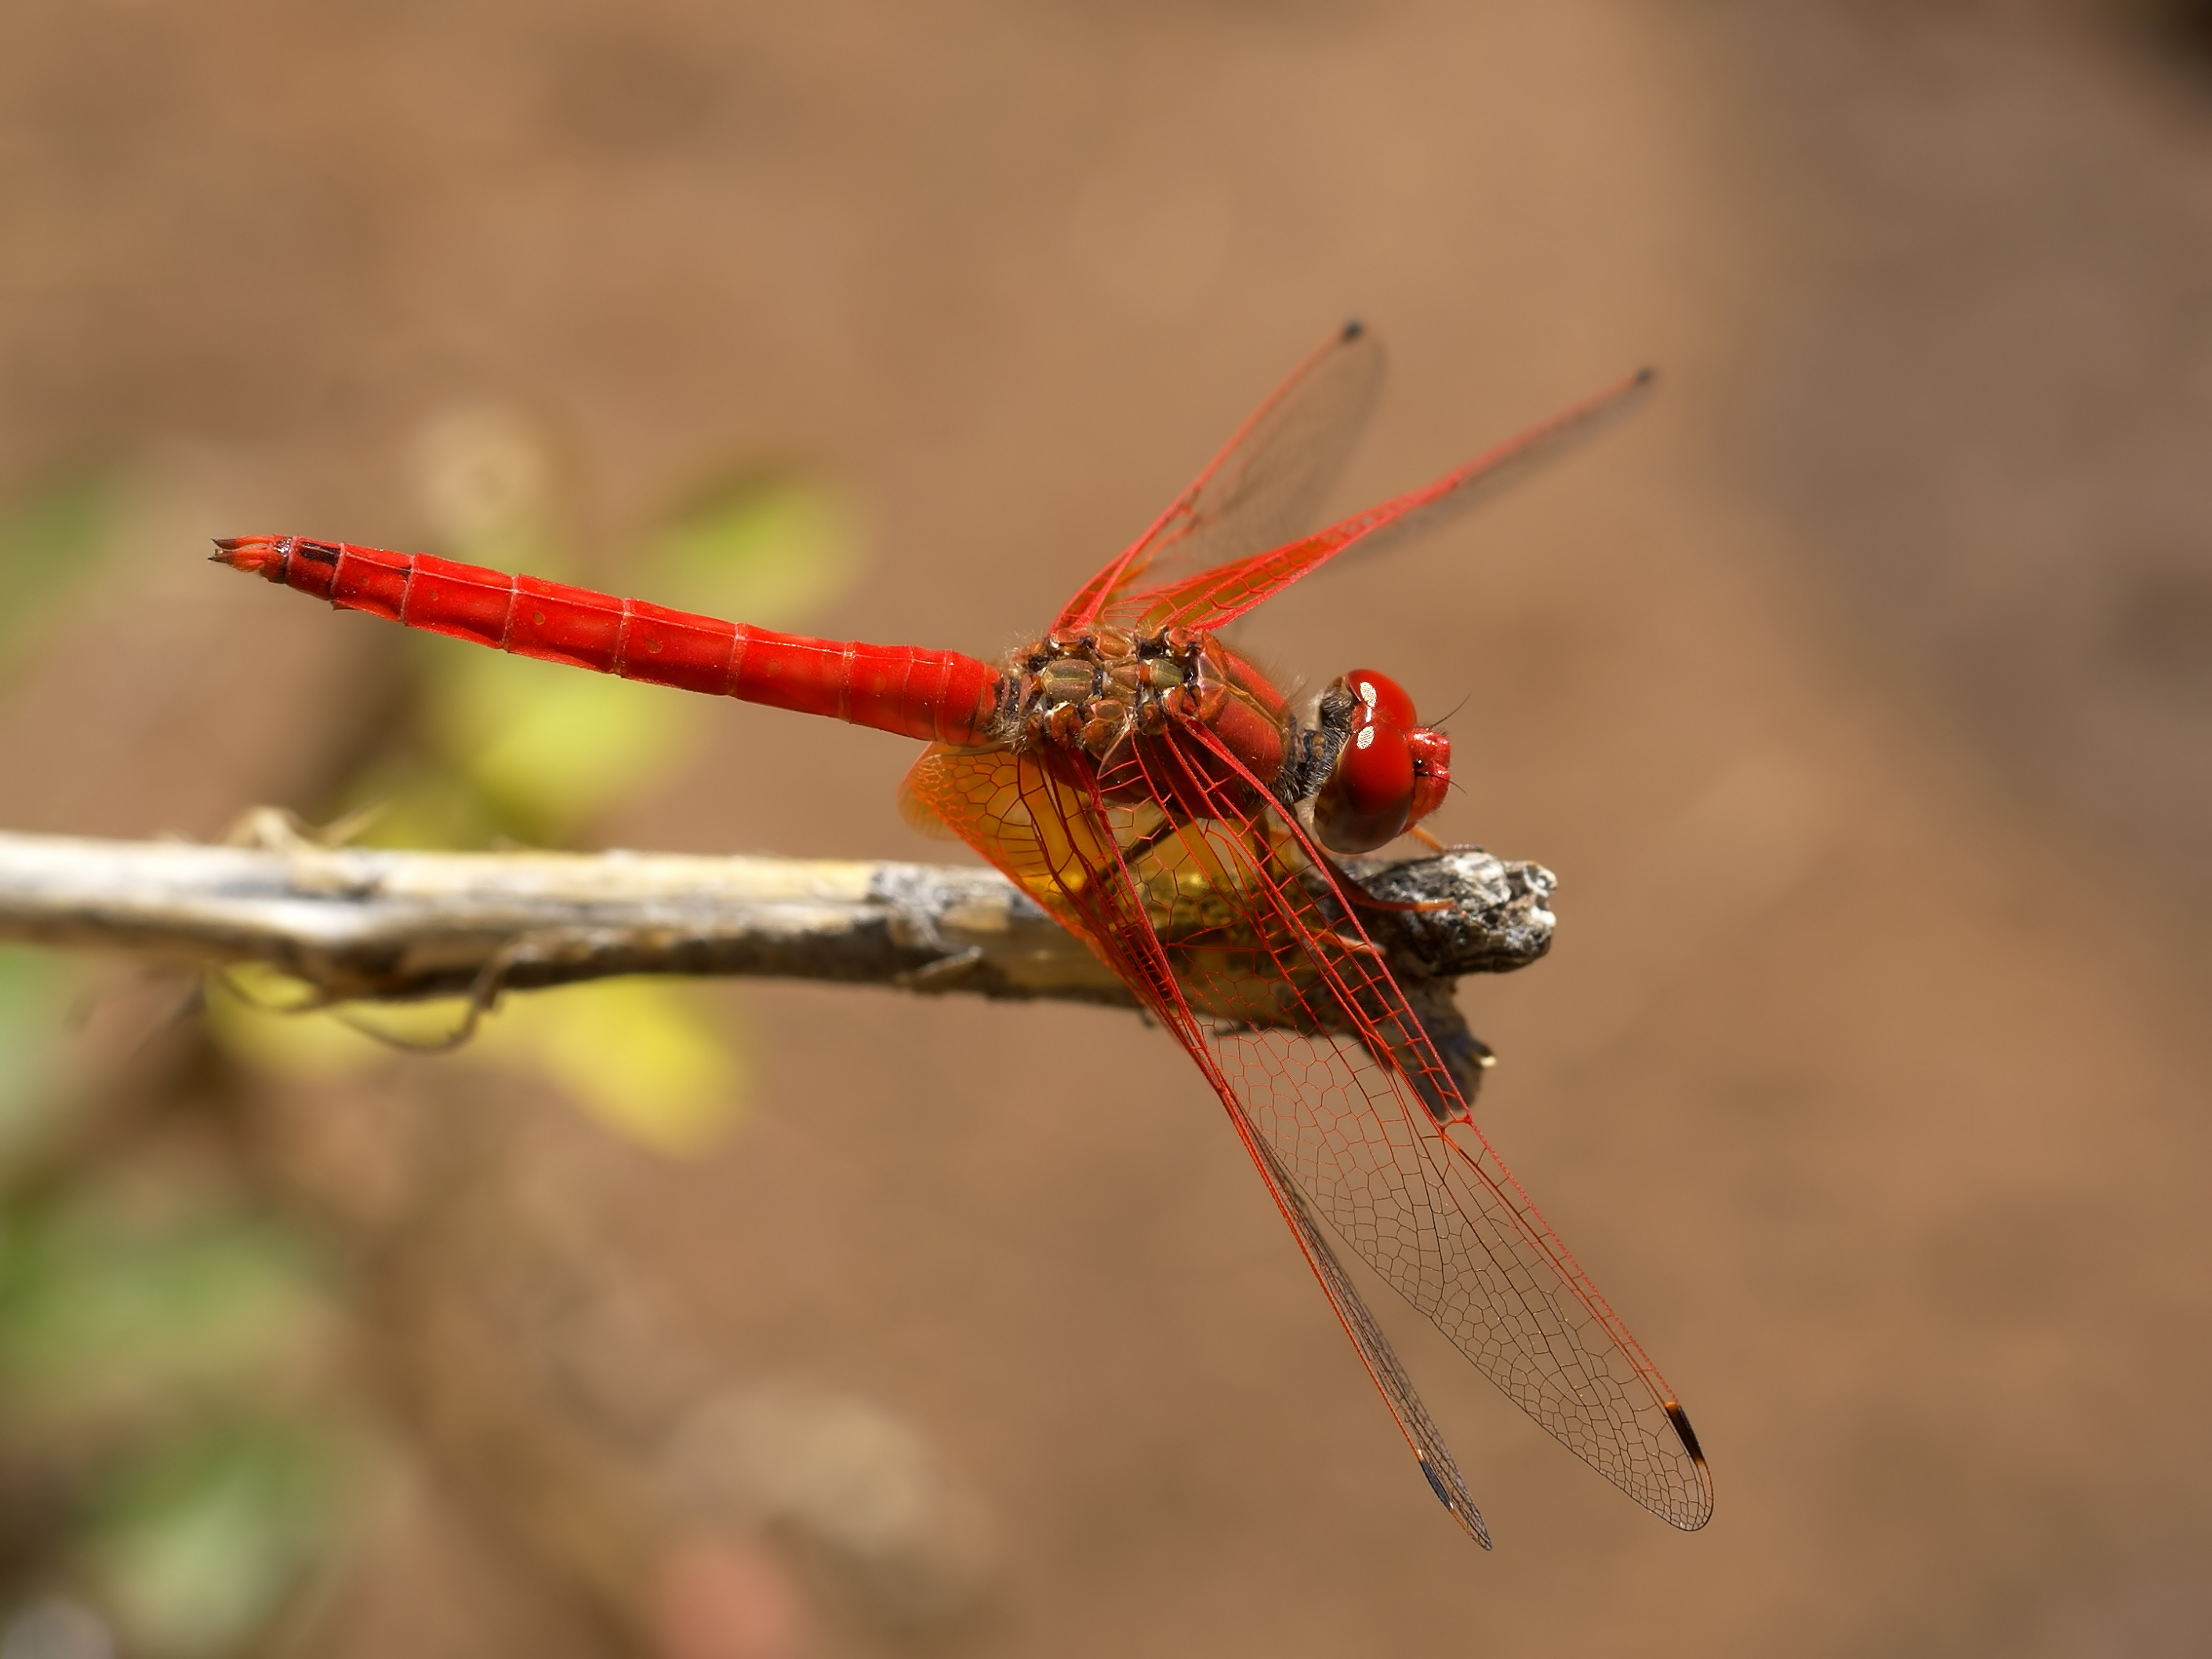 Dragonfly Wallpaper 2821x2116